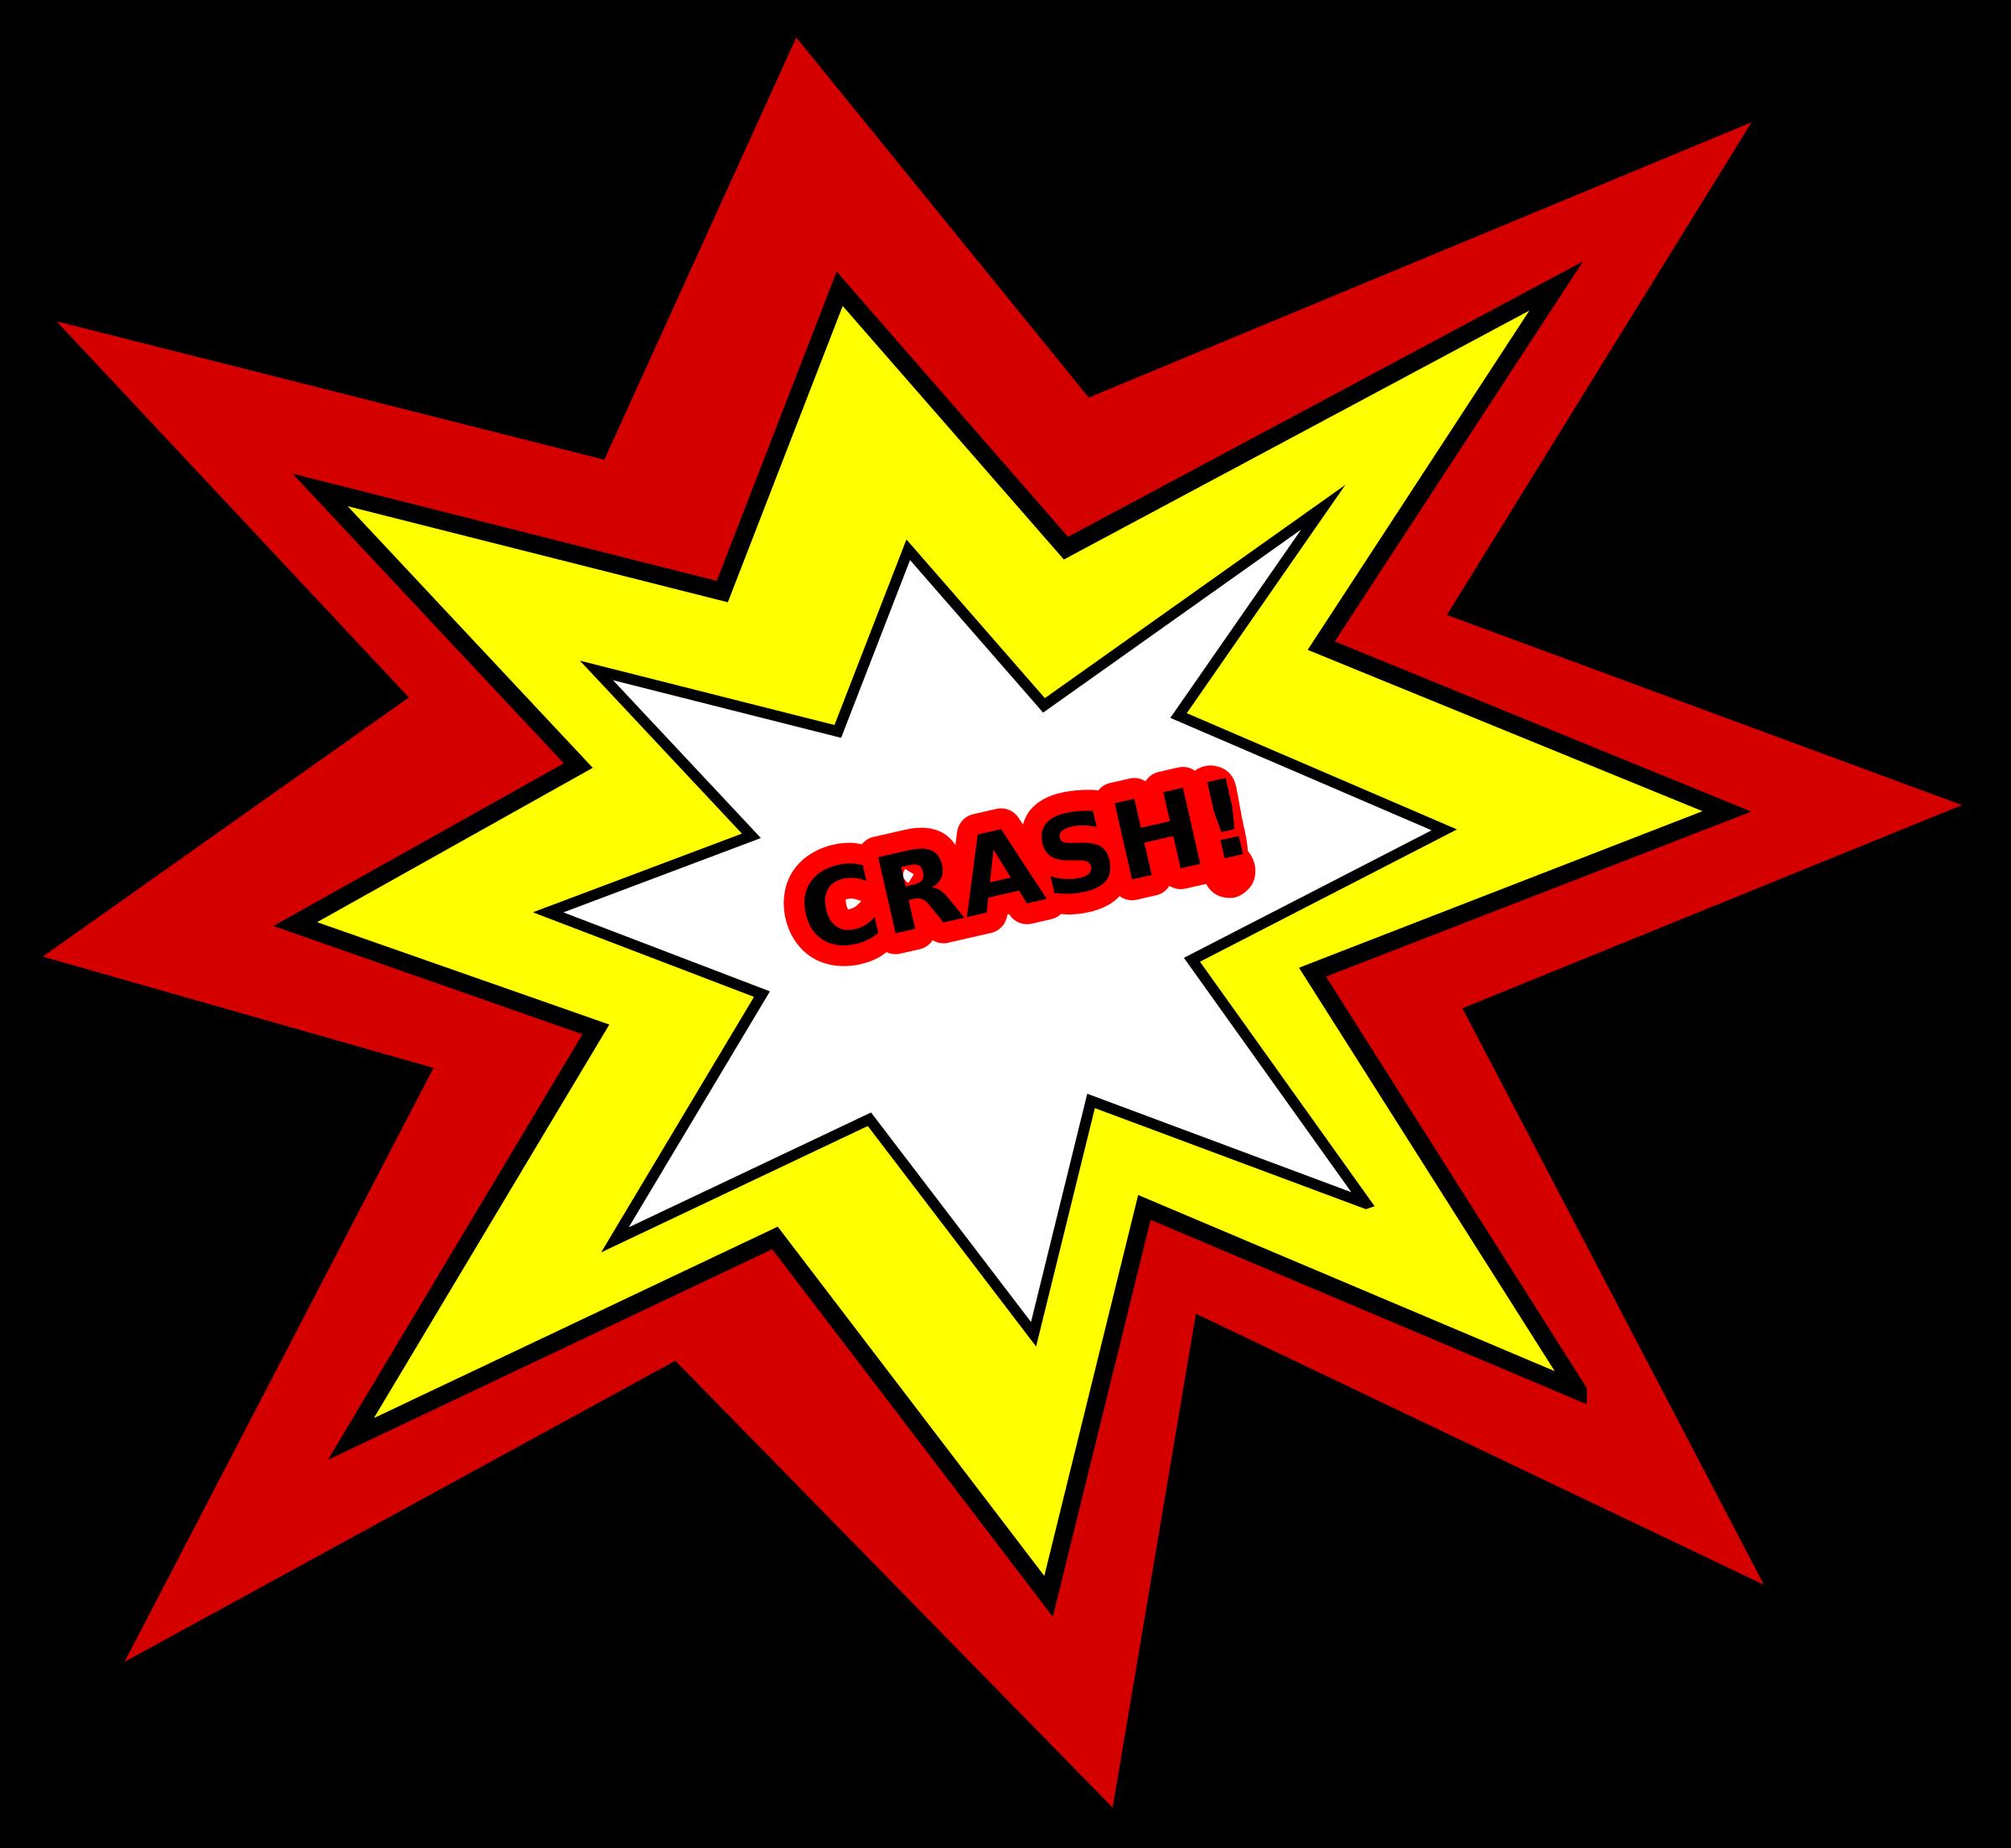 Crashed svg #5, Download drawings